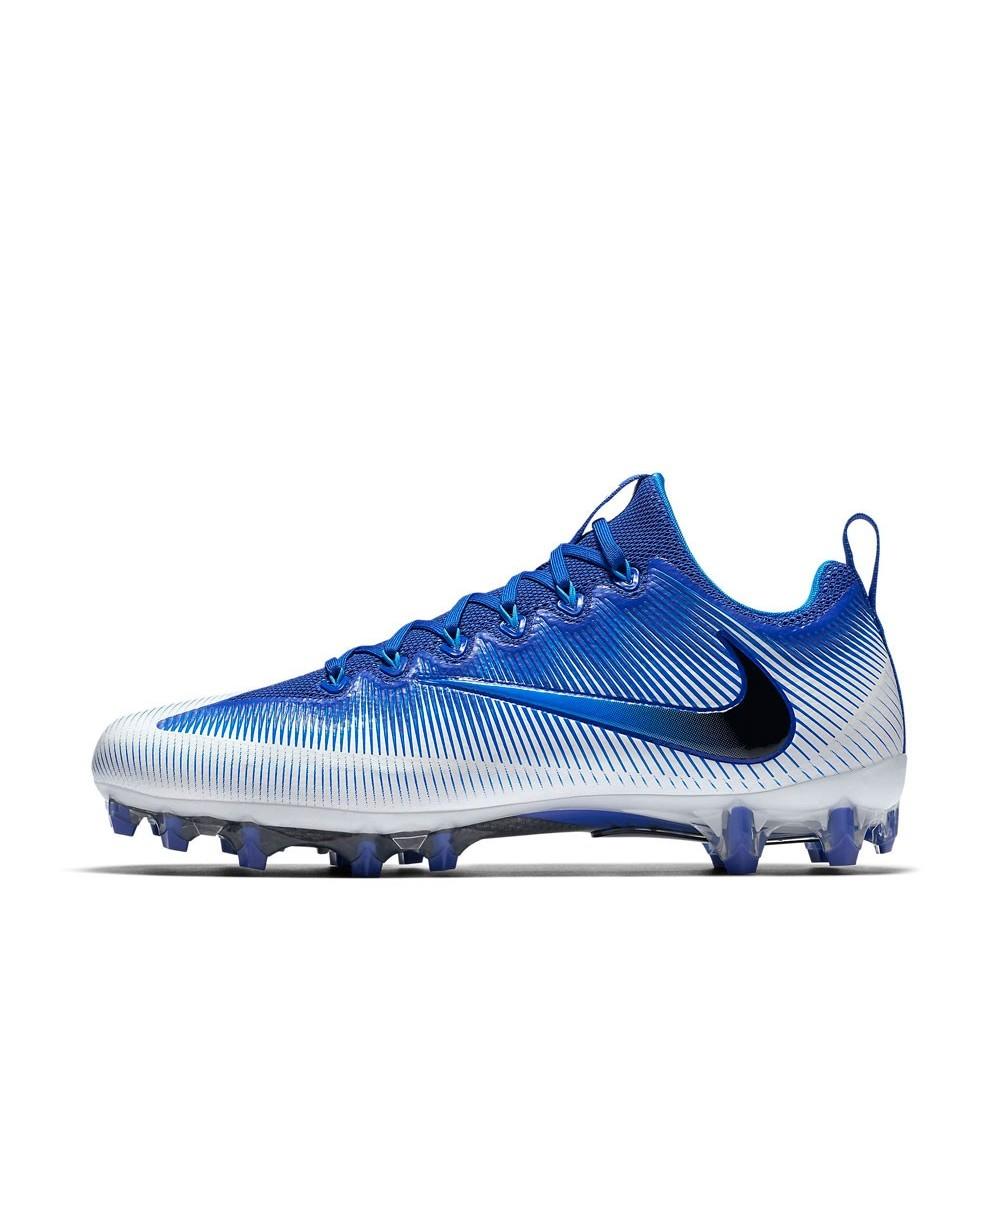 buy online a37bf ec3b2 Nike - American Football Cleats for men, model Vapor Untouchable Pro,  colour Racer Blue/White/Omega Blue/Black